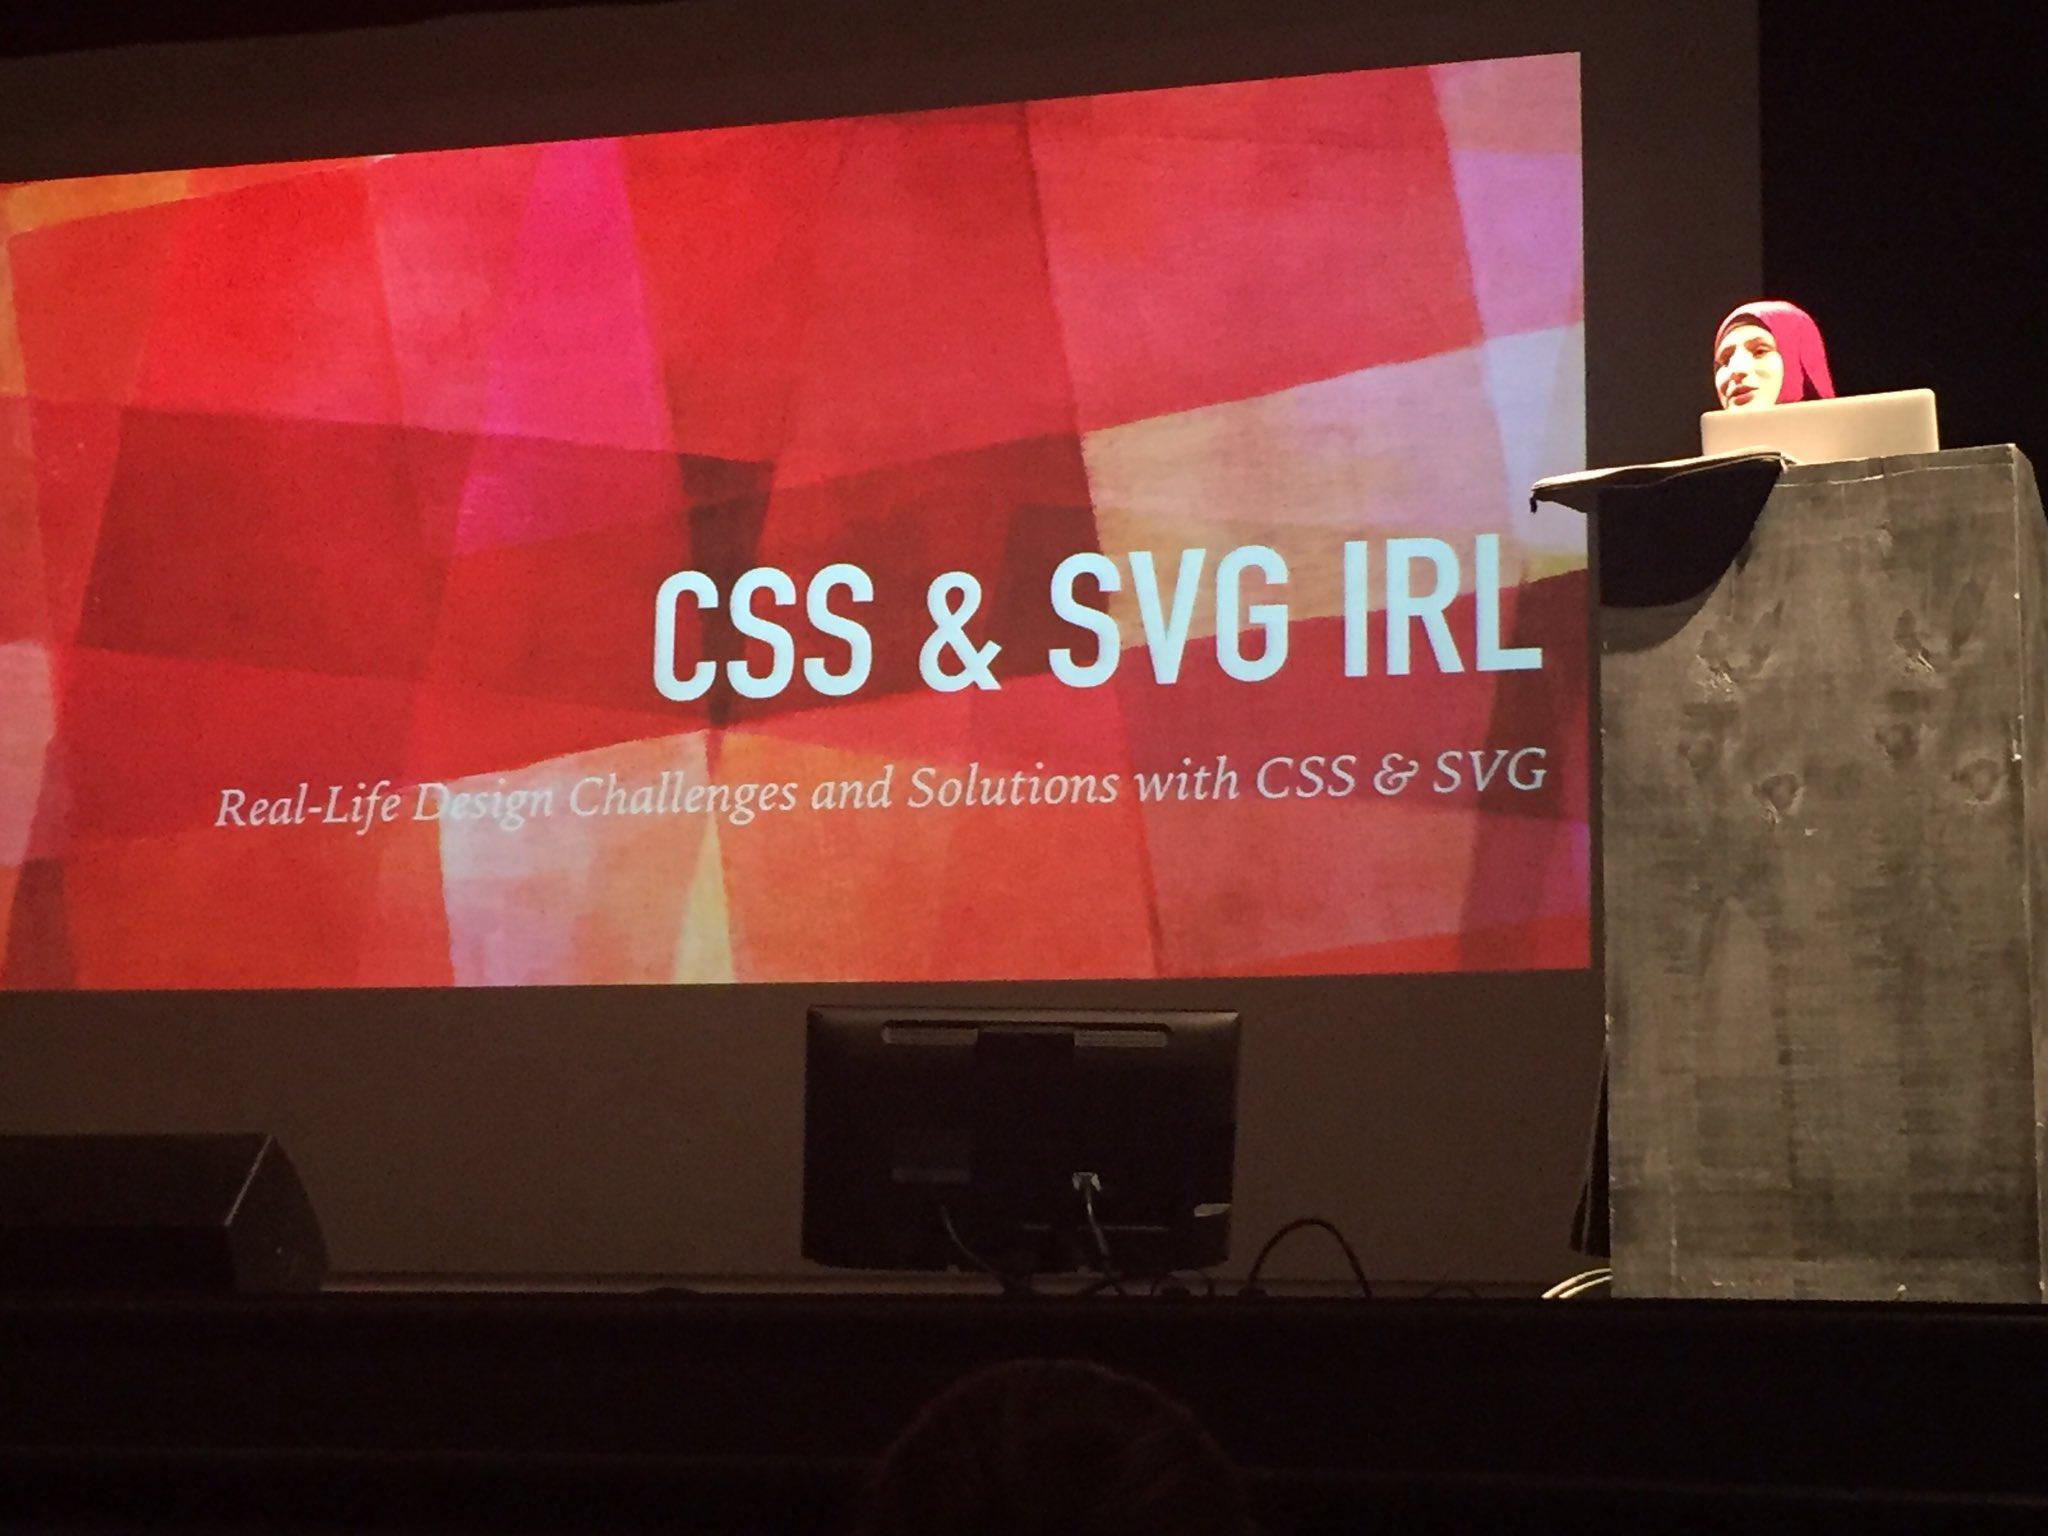 """CSS & SVG IRL"" @SaraSoueidan #ftf16 https://t.co/xjws6QUHWa"